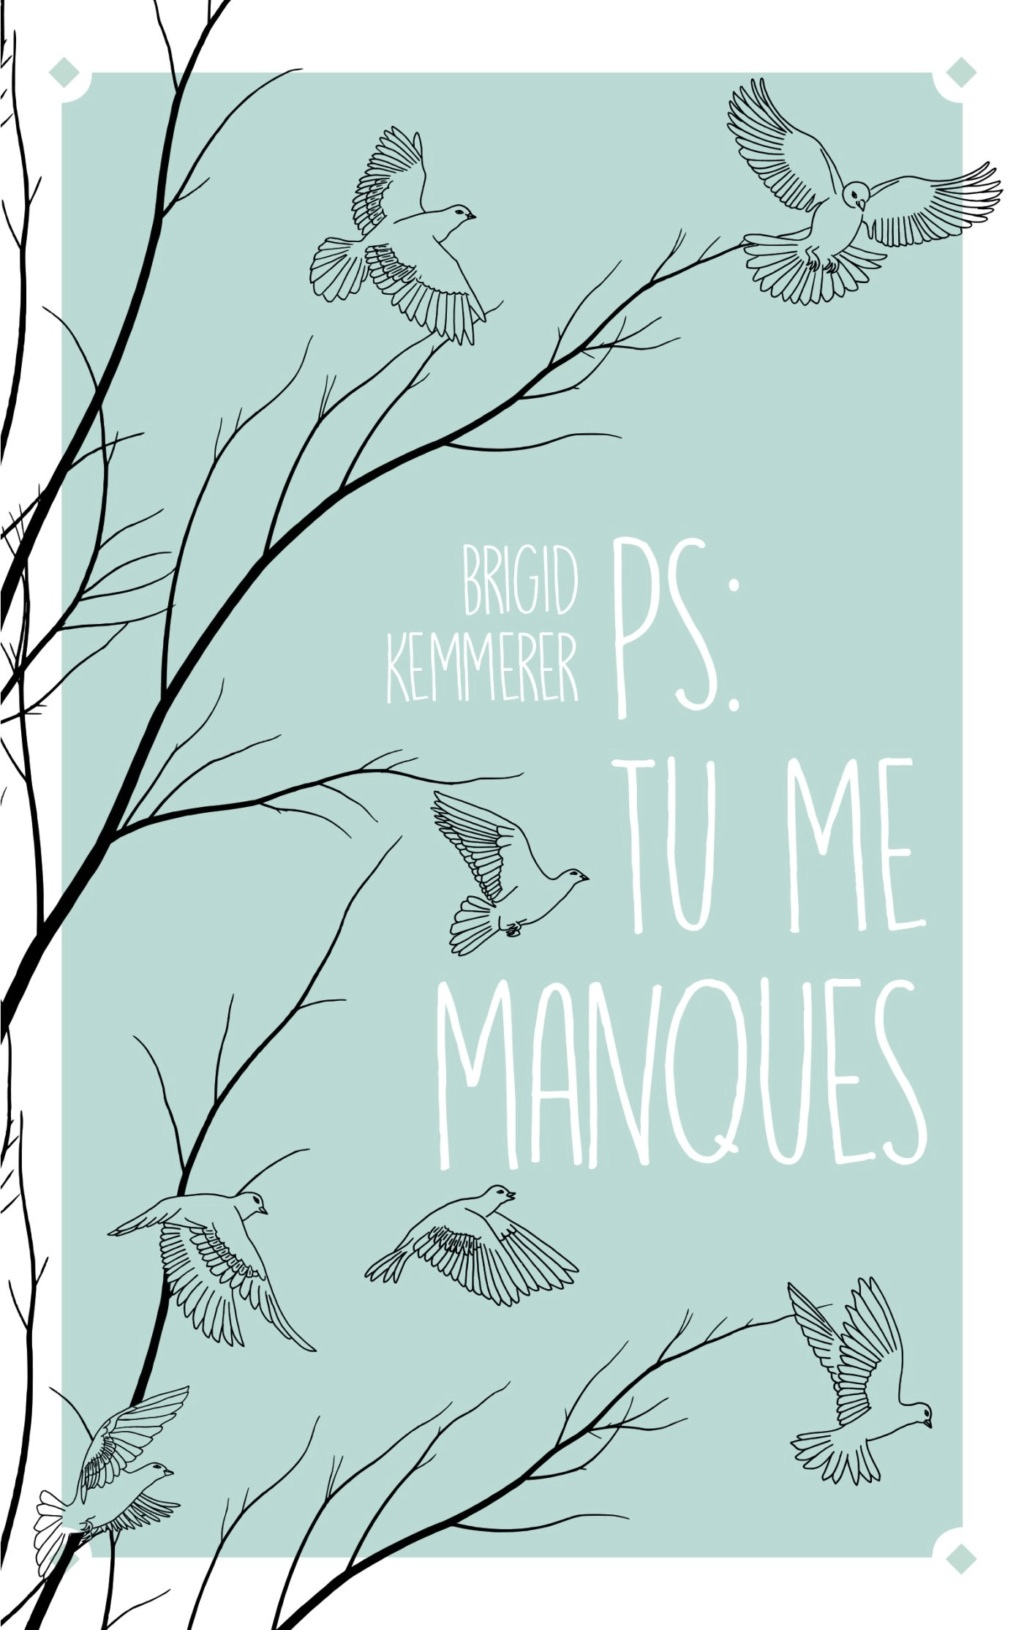 KEMMERER Brigid - Tome 1 : P.S. Tu me manques Ps_tu_10